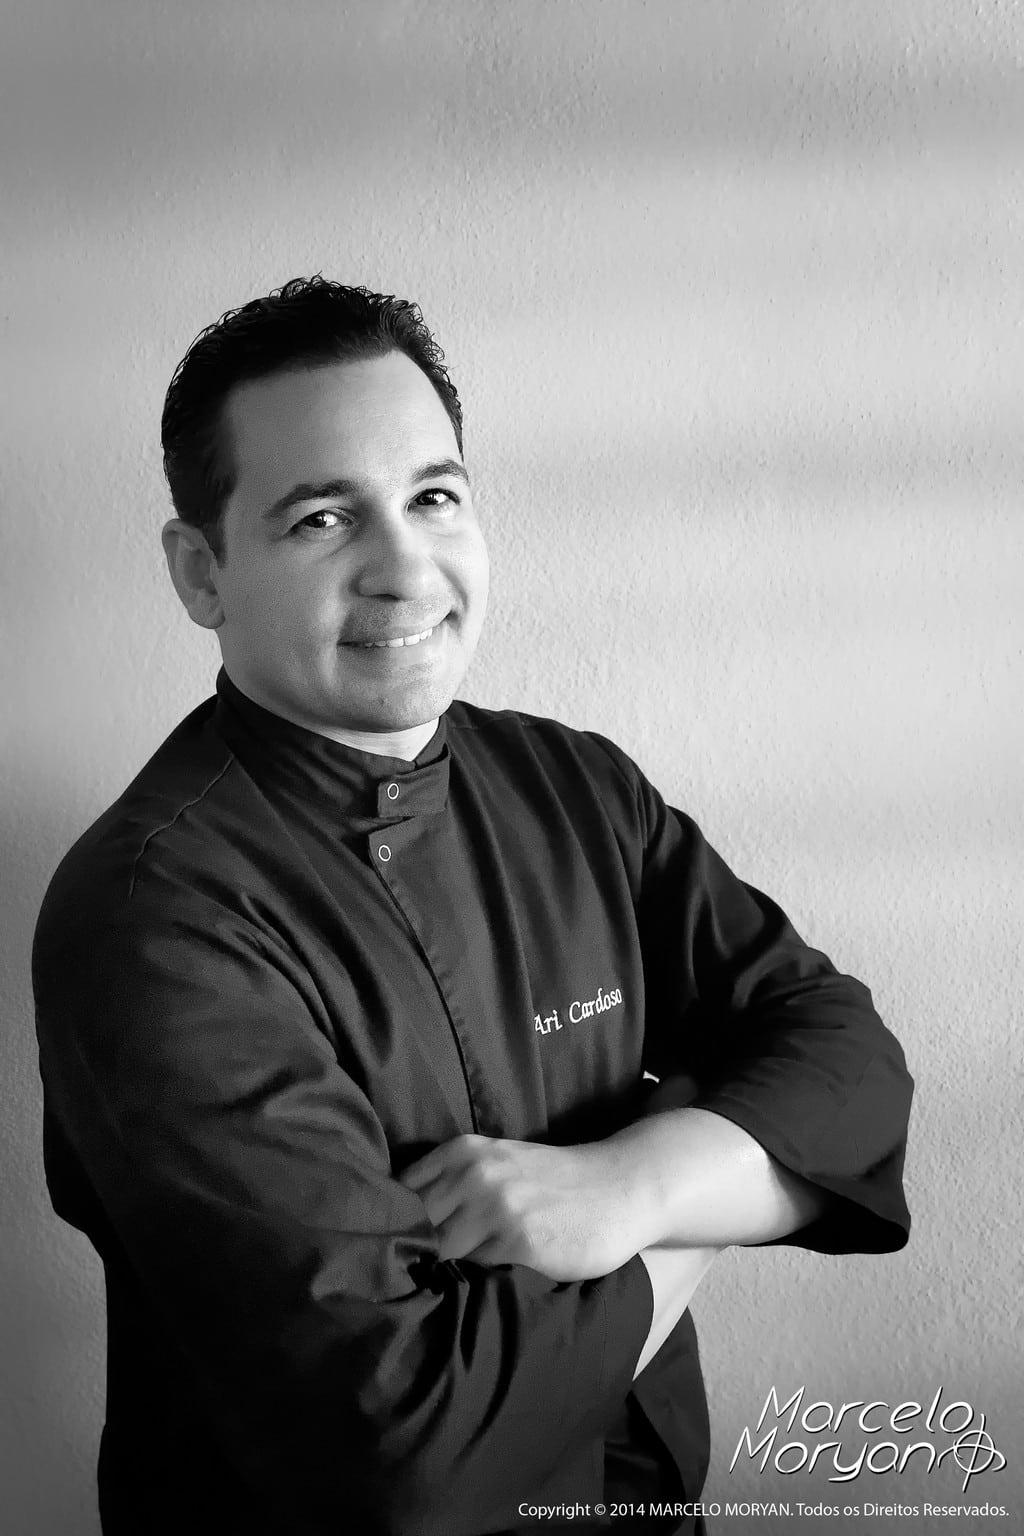 Chef Ari Cardoso